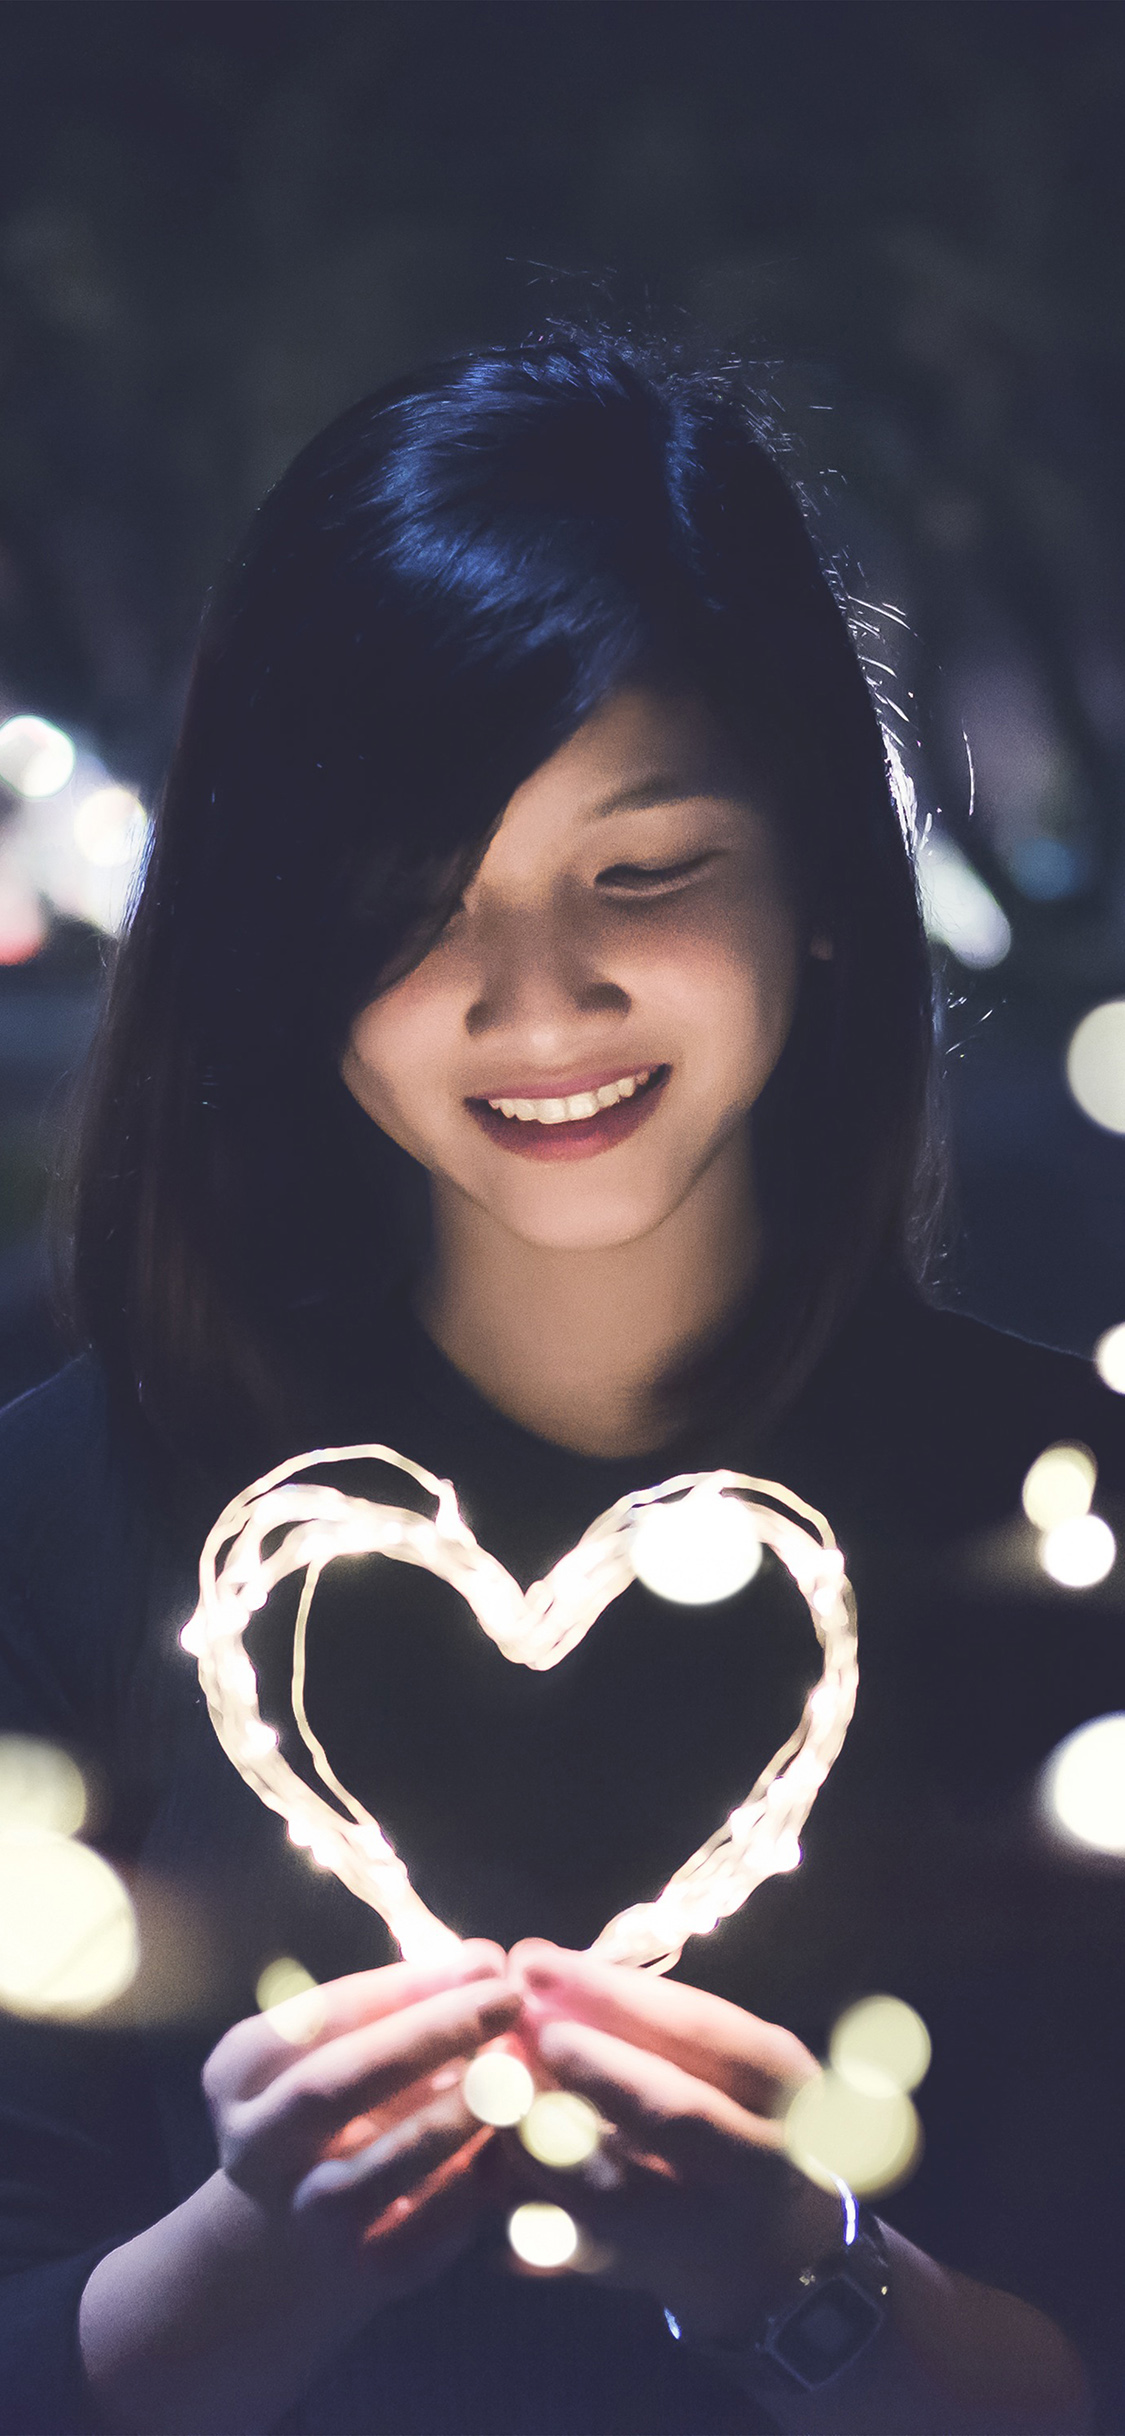 Love Girl Light Dark Night Bokeh Iphone X Wallpapers Free